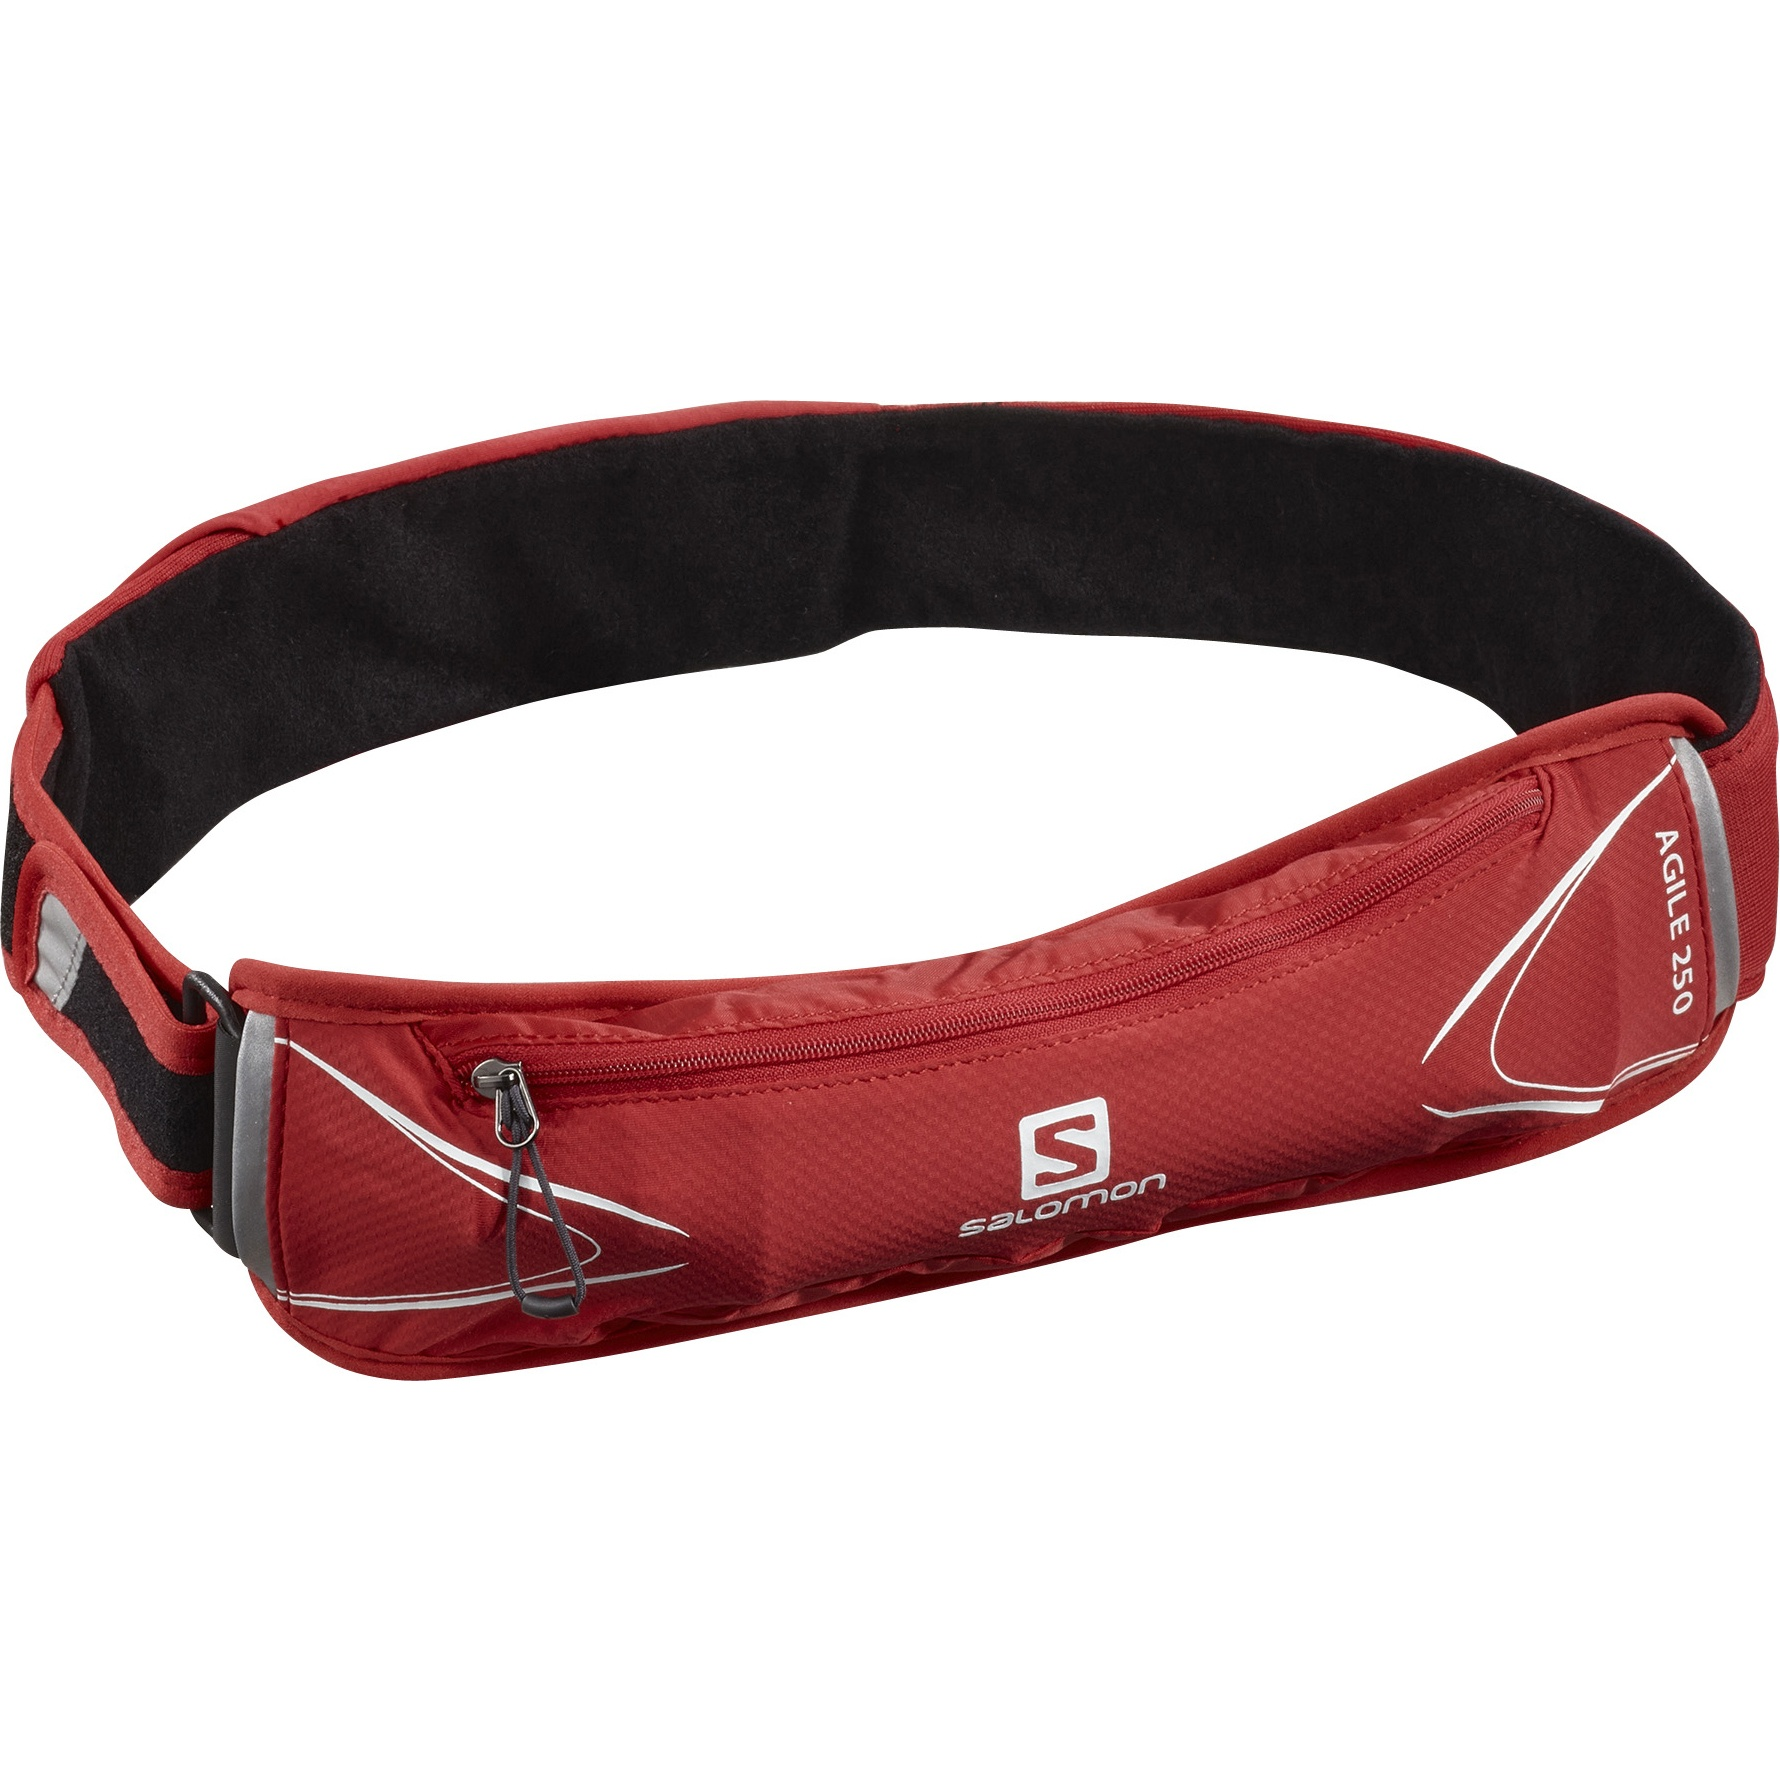 Picture of Salomon Agile 250 Belt Set Hydration Belt - Goji Berry